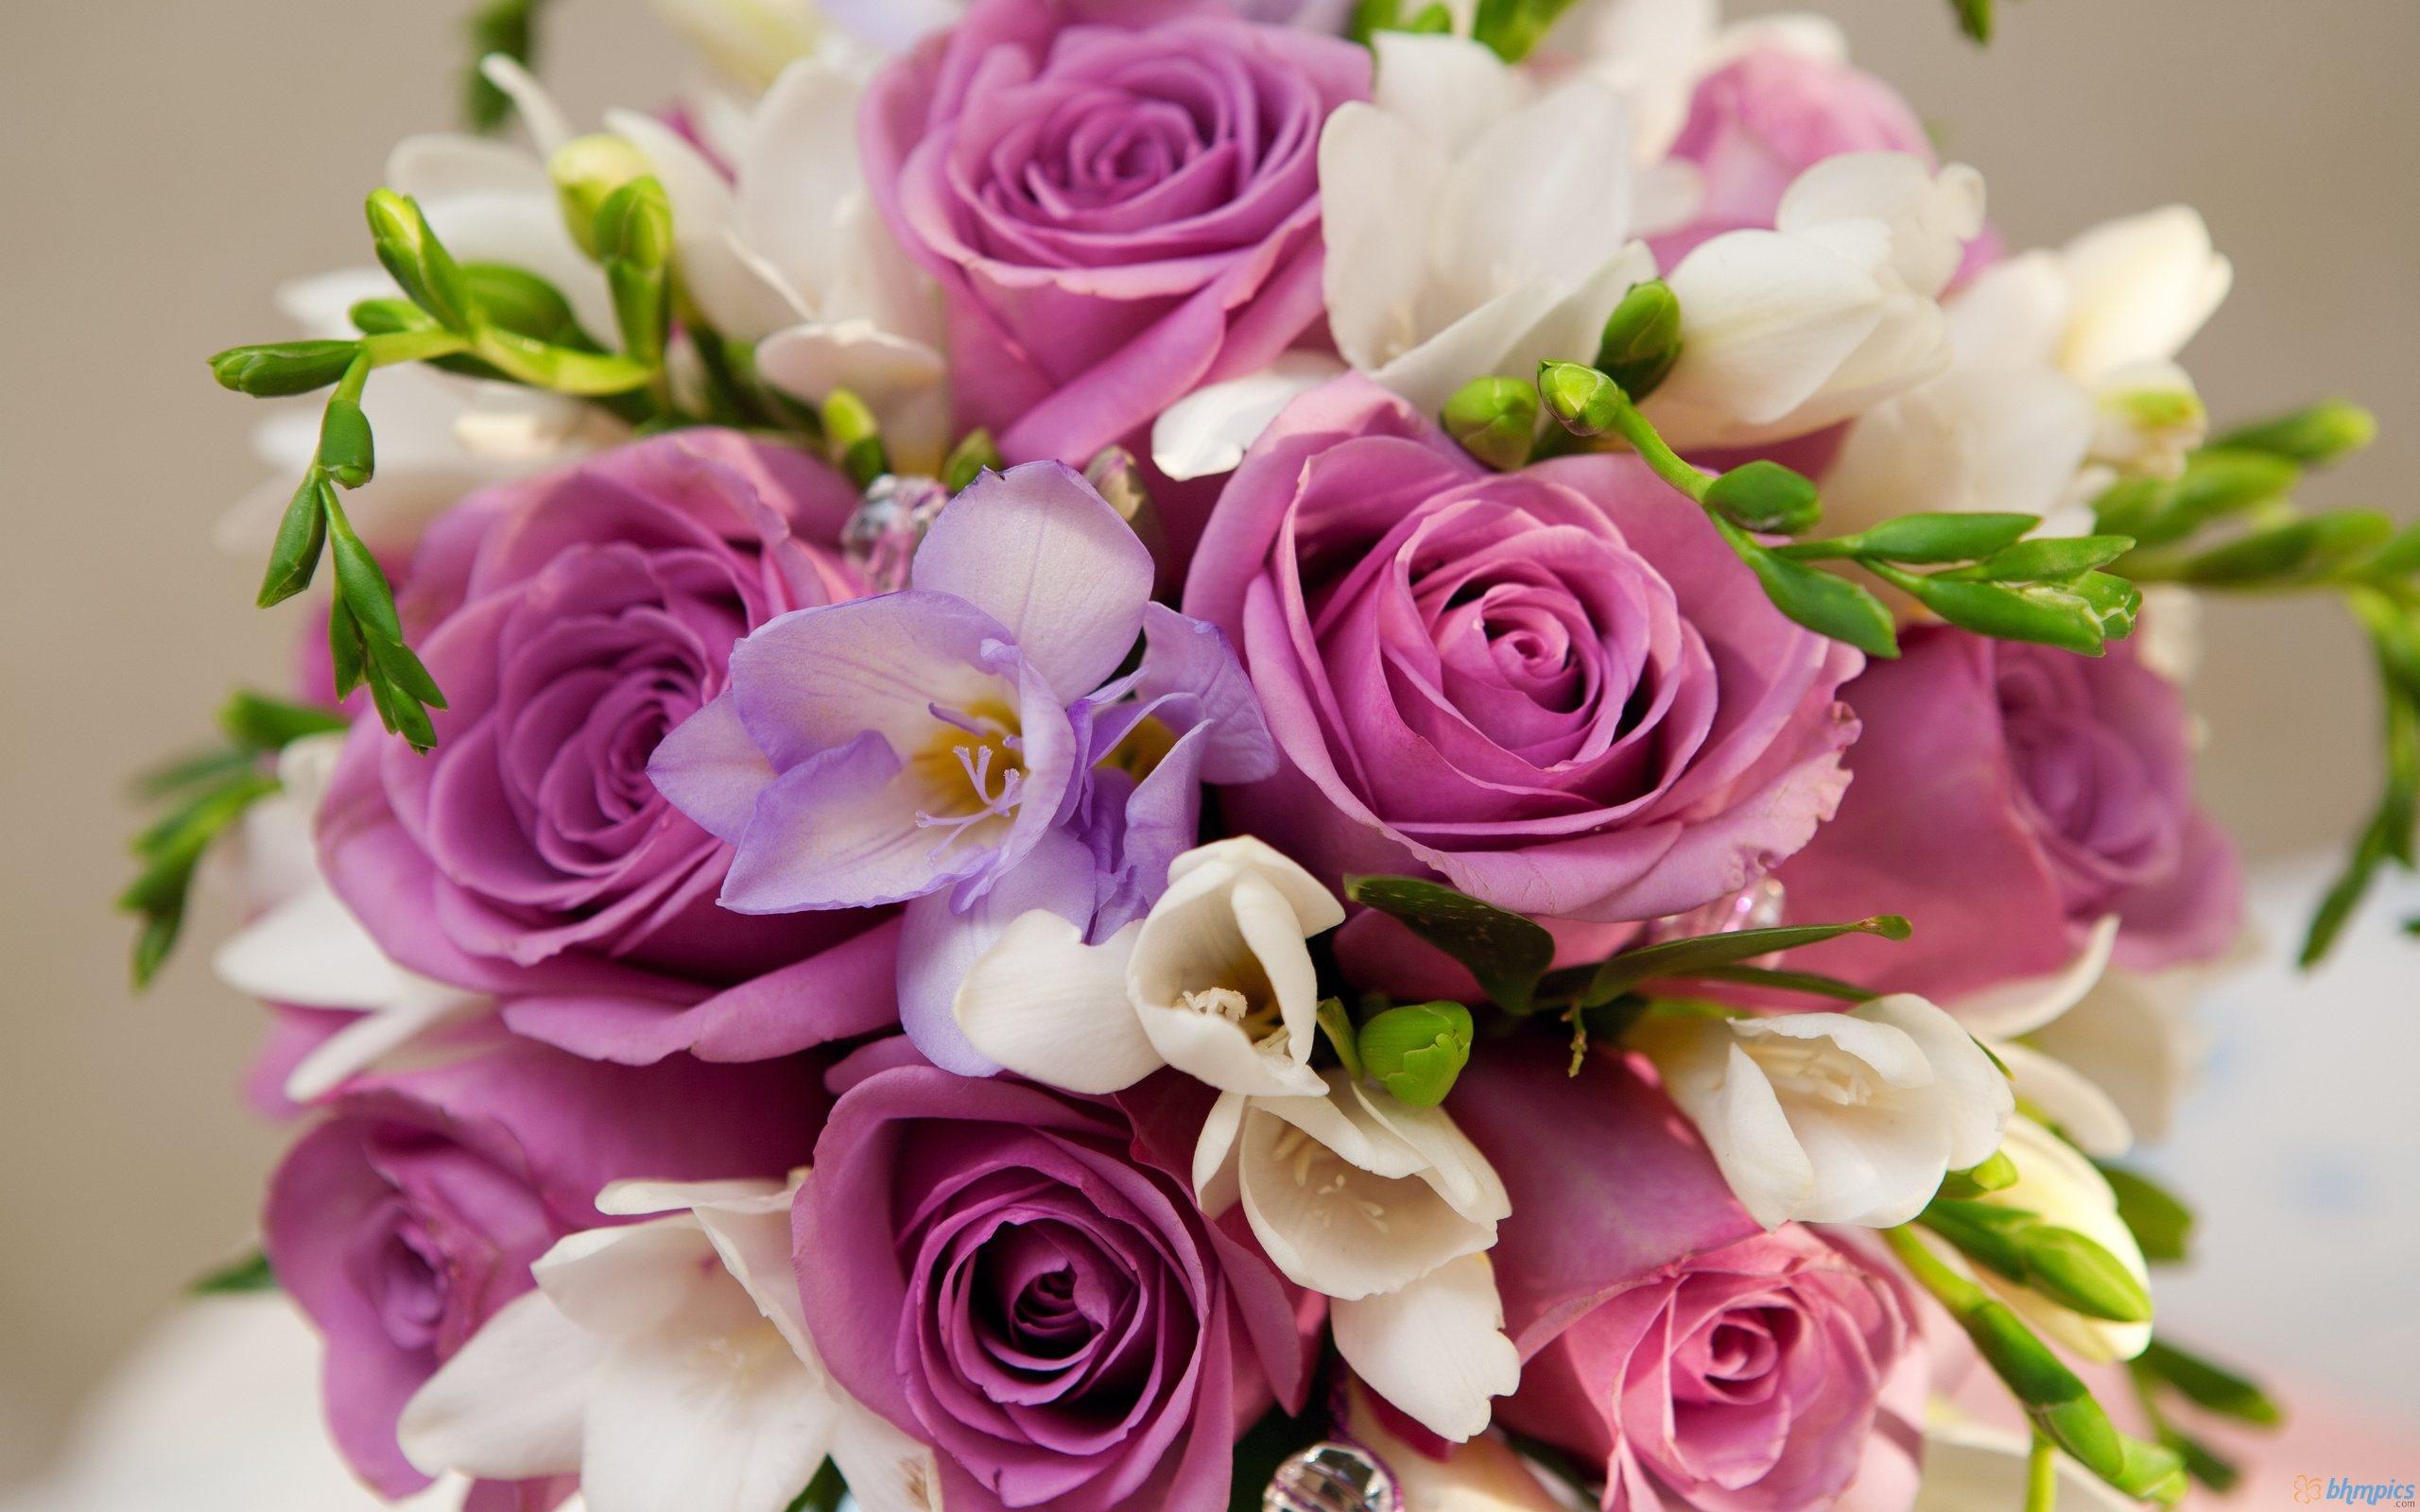 بالصور صور اجمل الورود , اجمل الورود واحلاها 3662 4